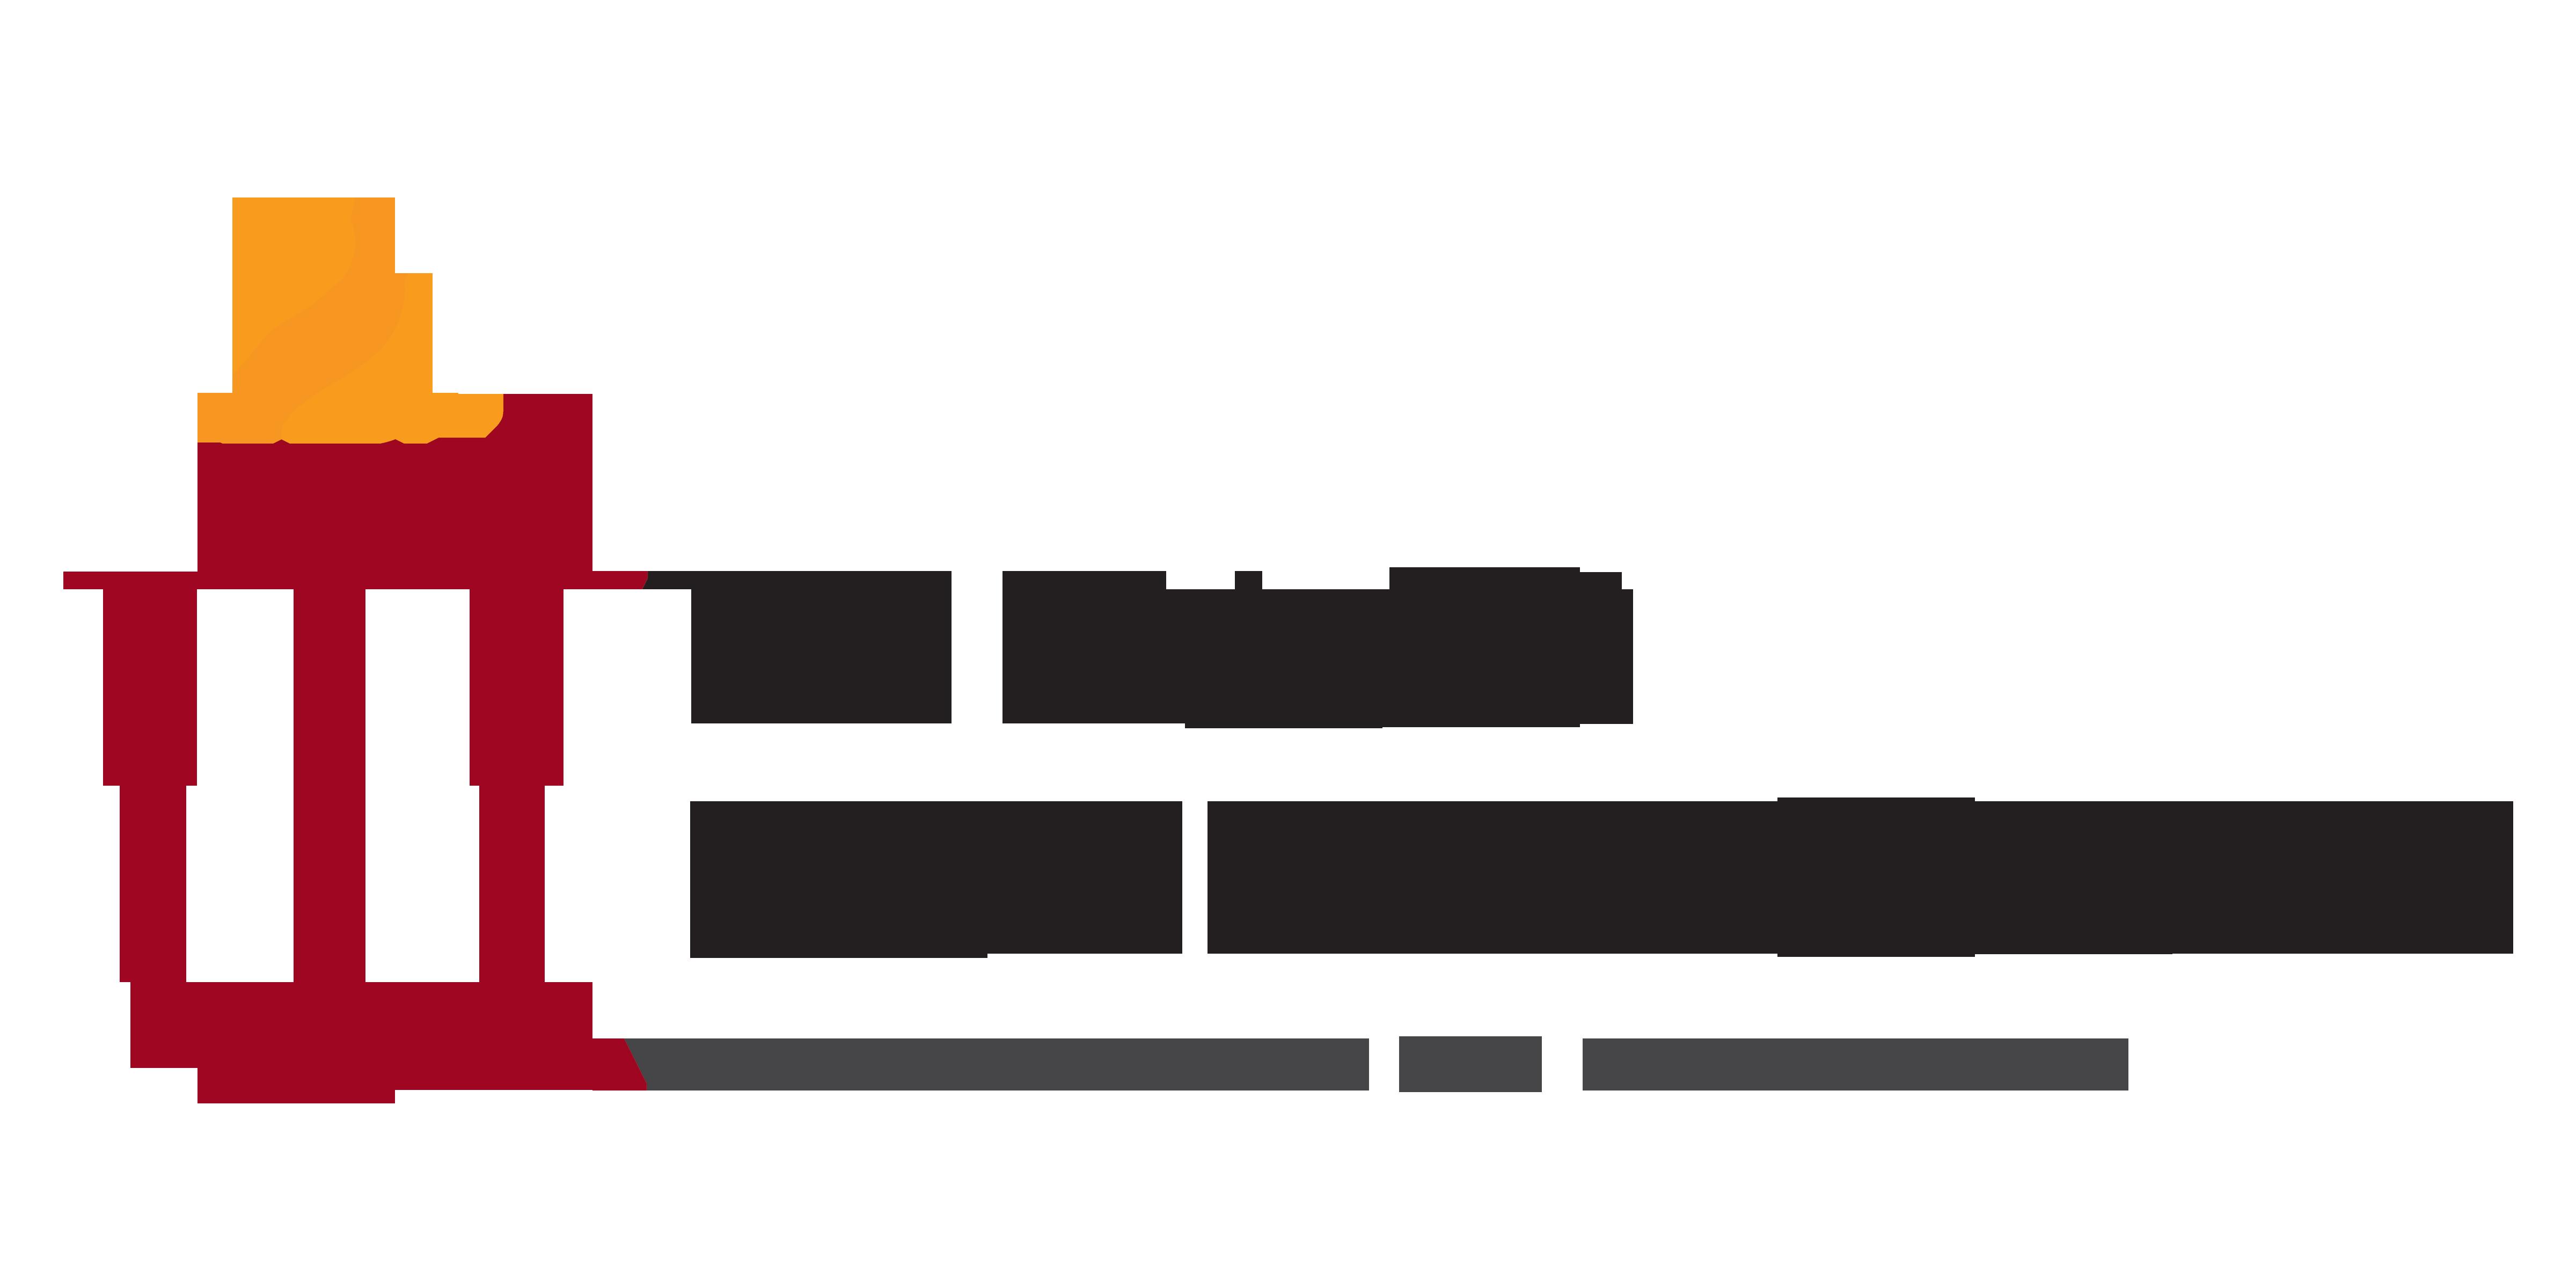 Indus University Courses BBA BCA B.Com B.Tech , M.Tech B.Ed